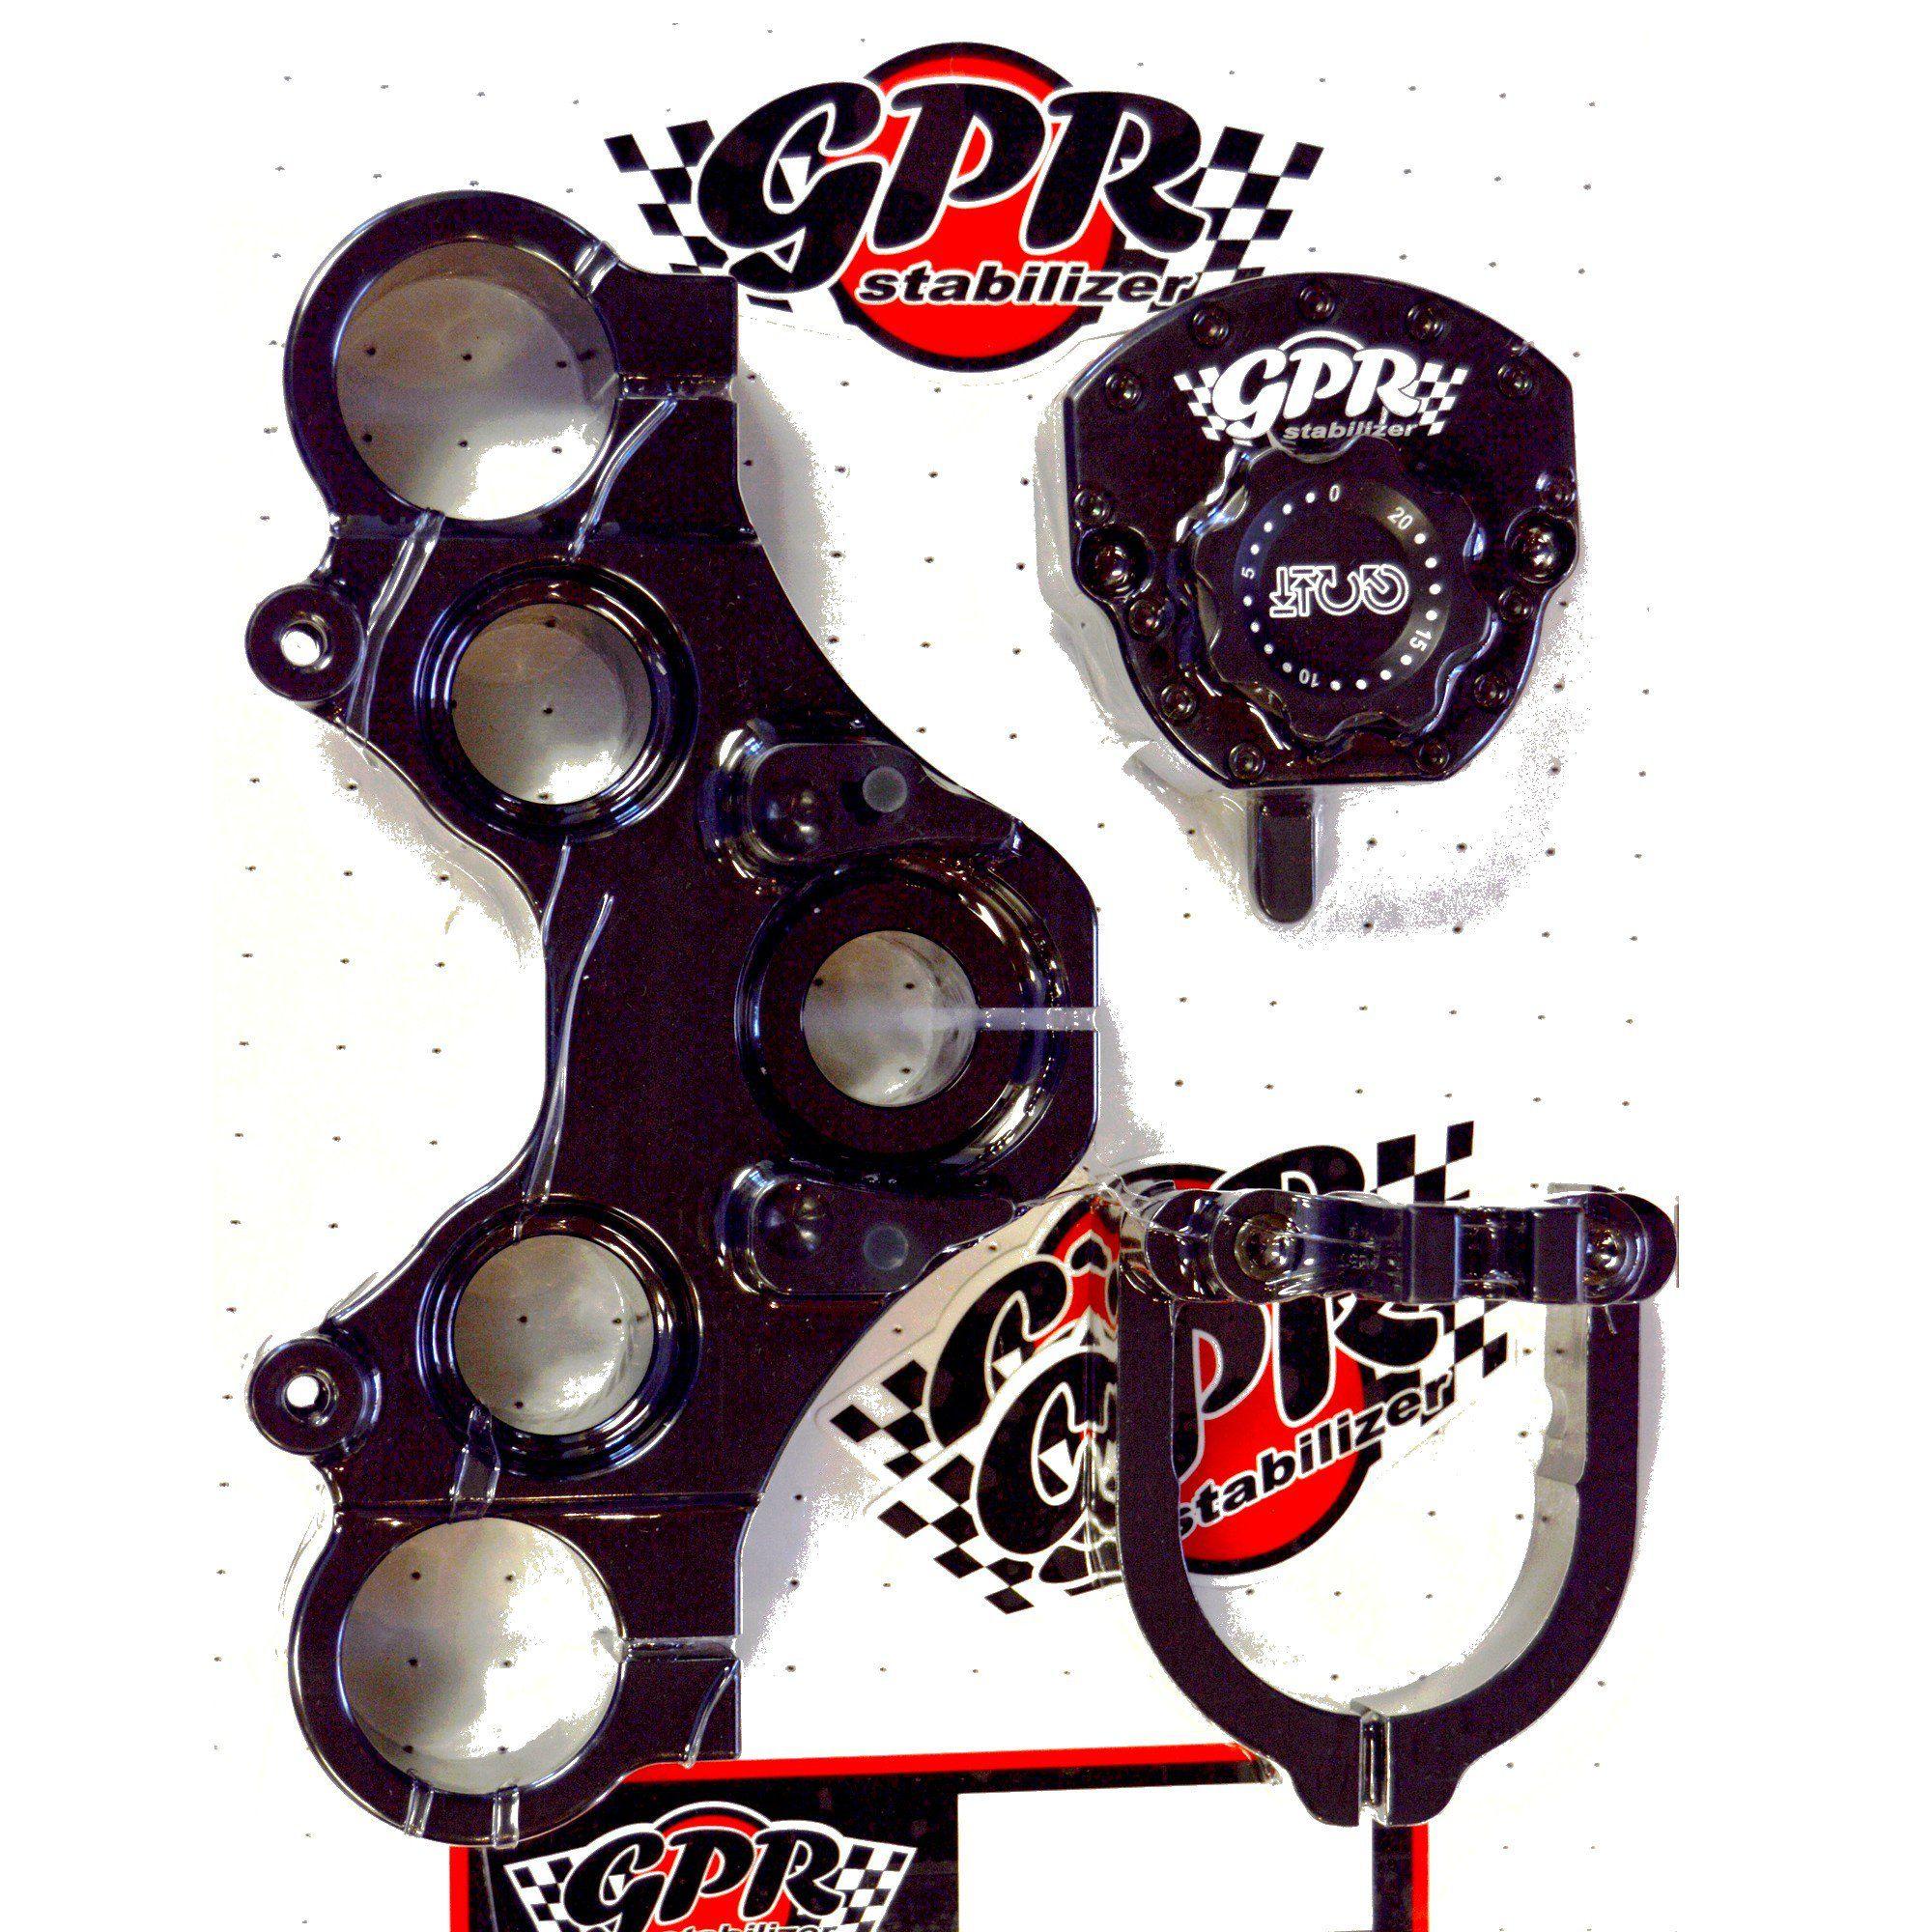 GPR V4 Steering Stabilizer for Harley Davidson Sportster